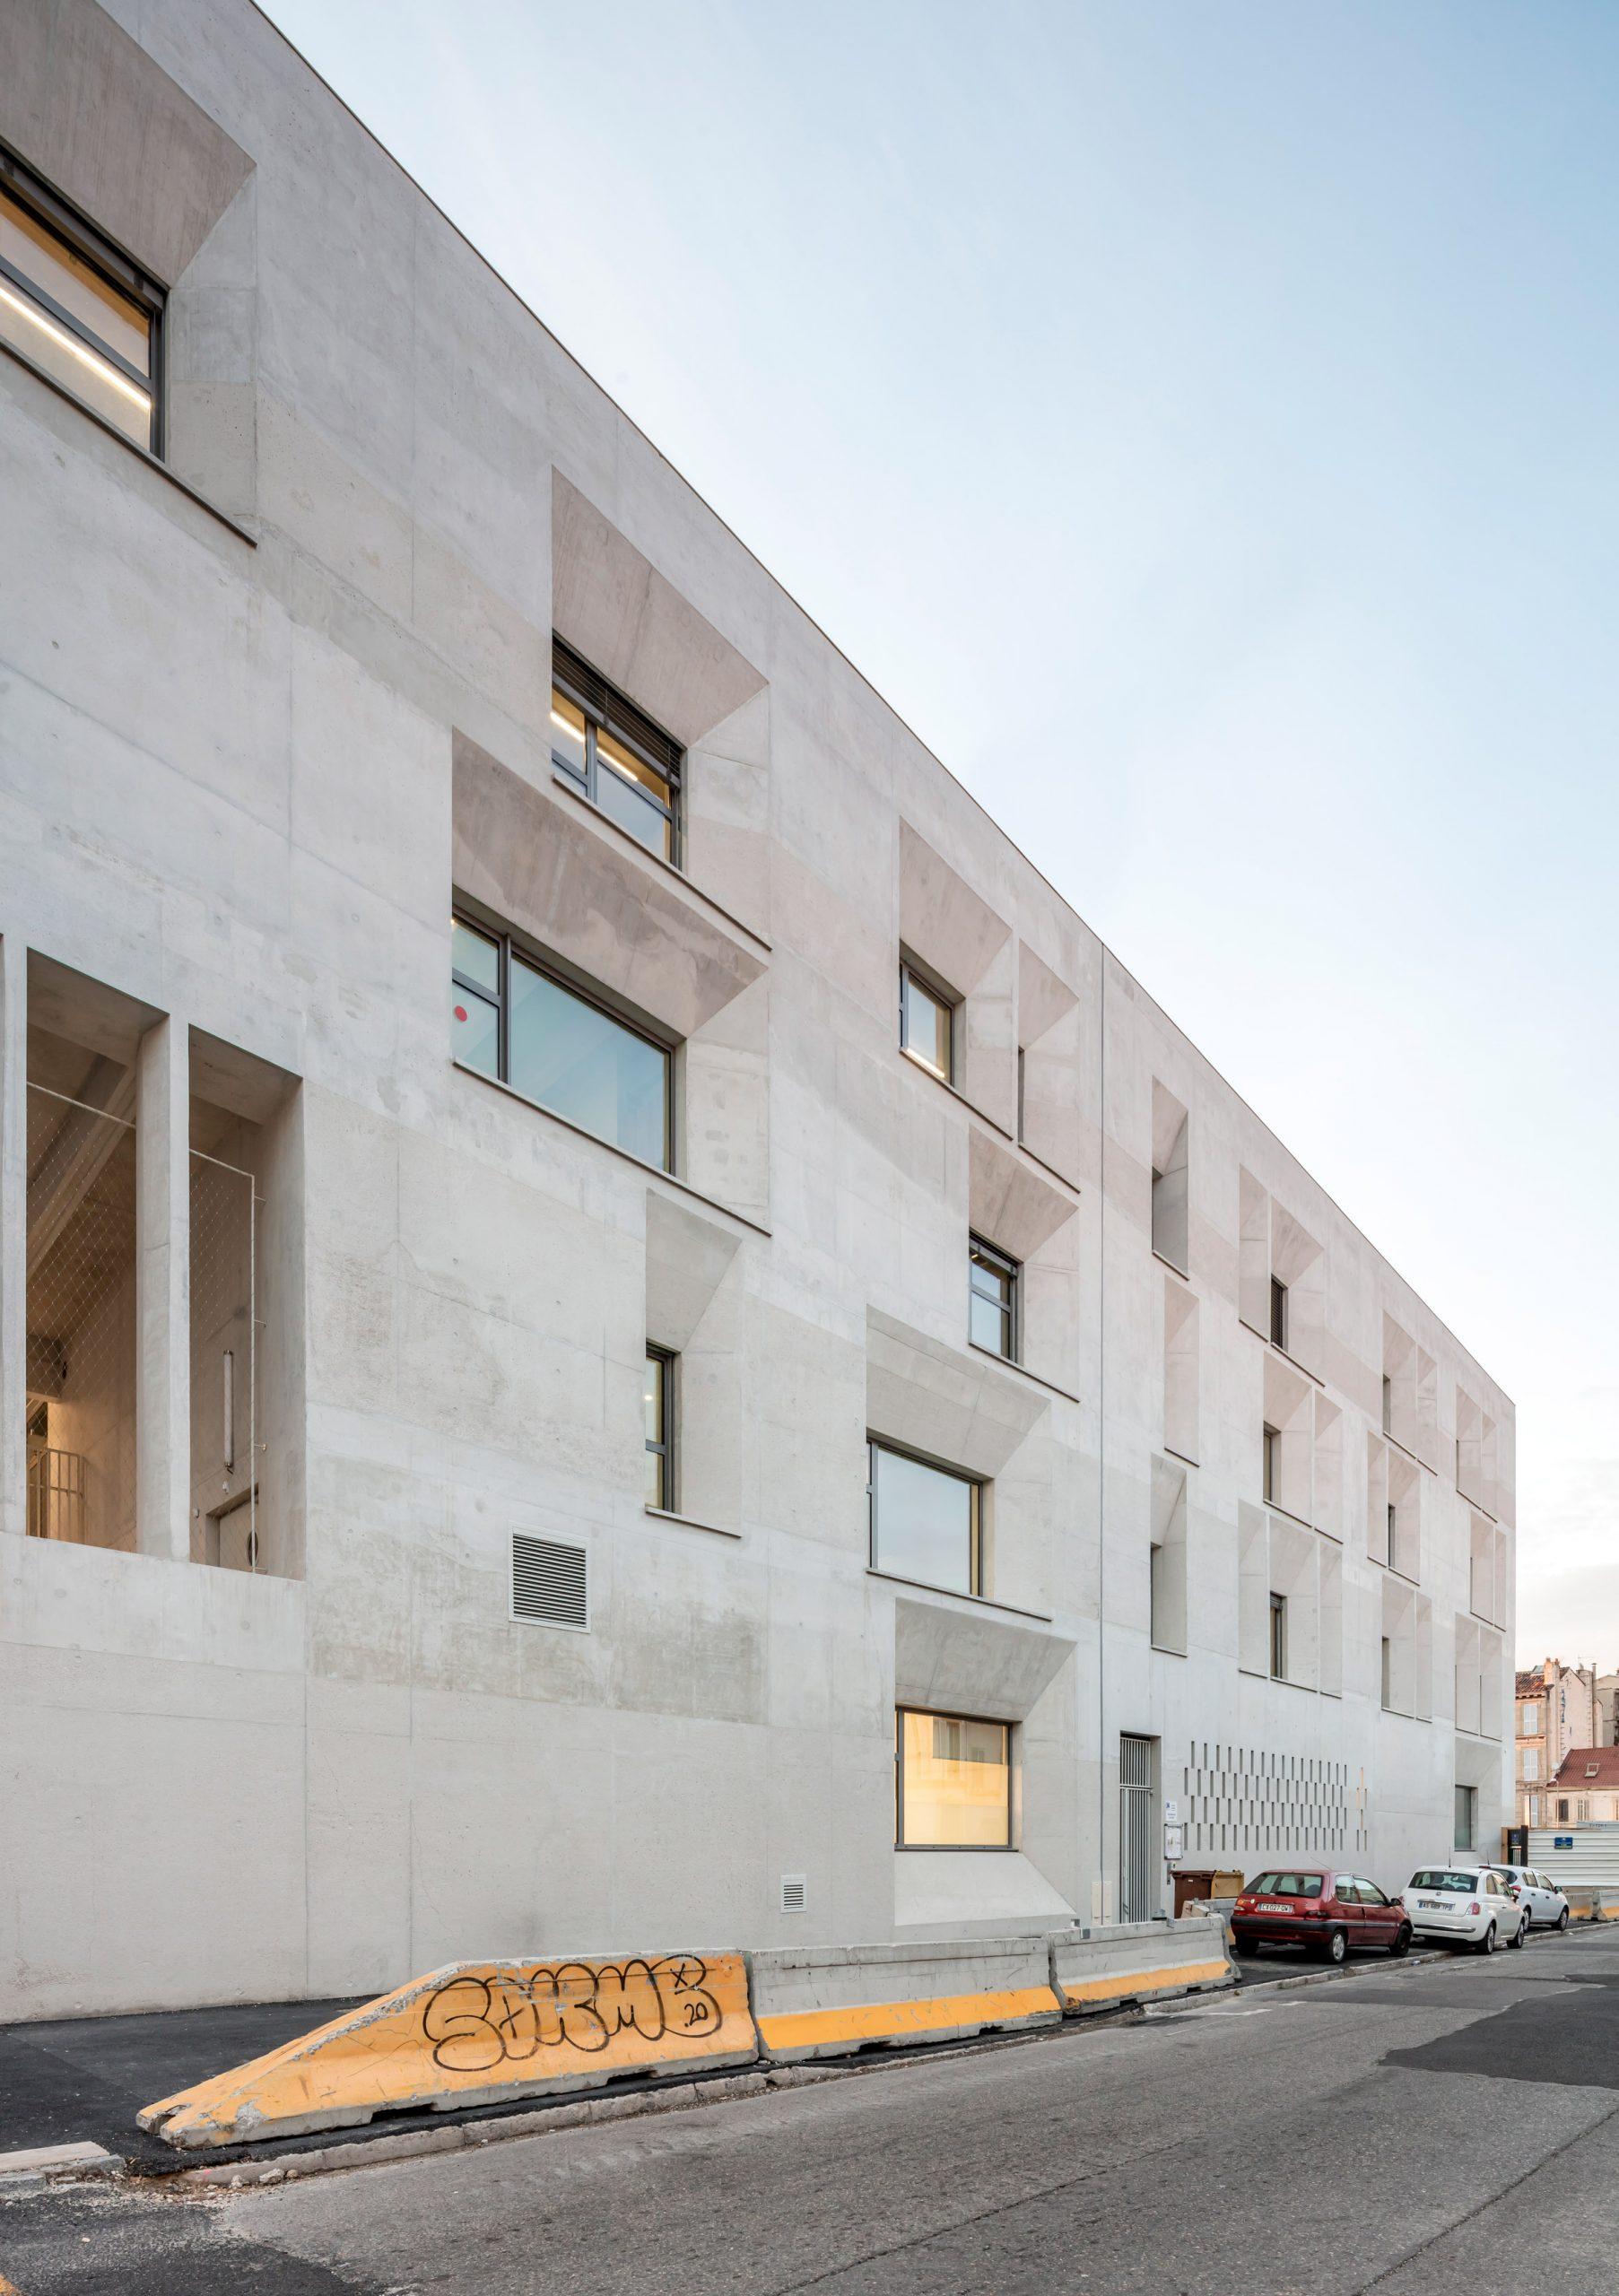 Windows were scattered across the facade of the Antoine de Ruffi School